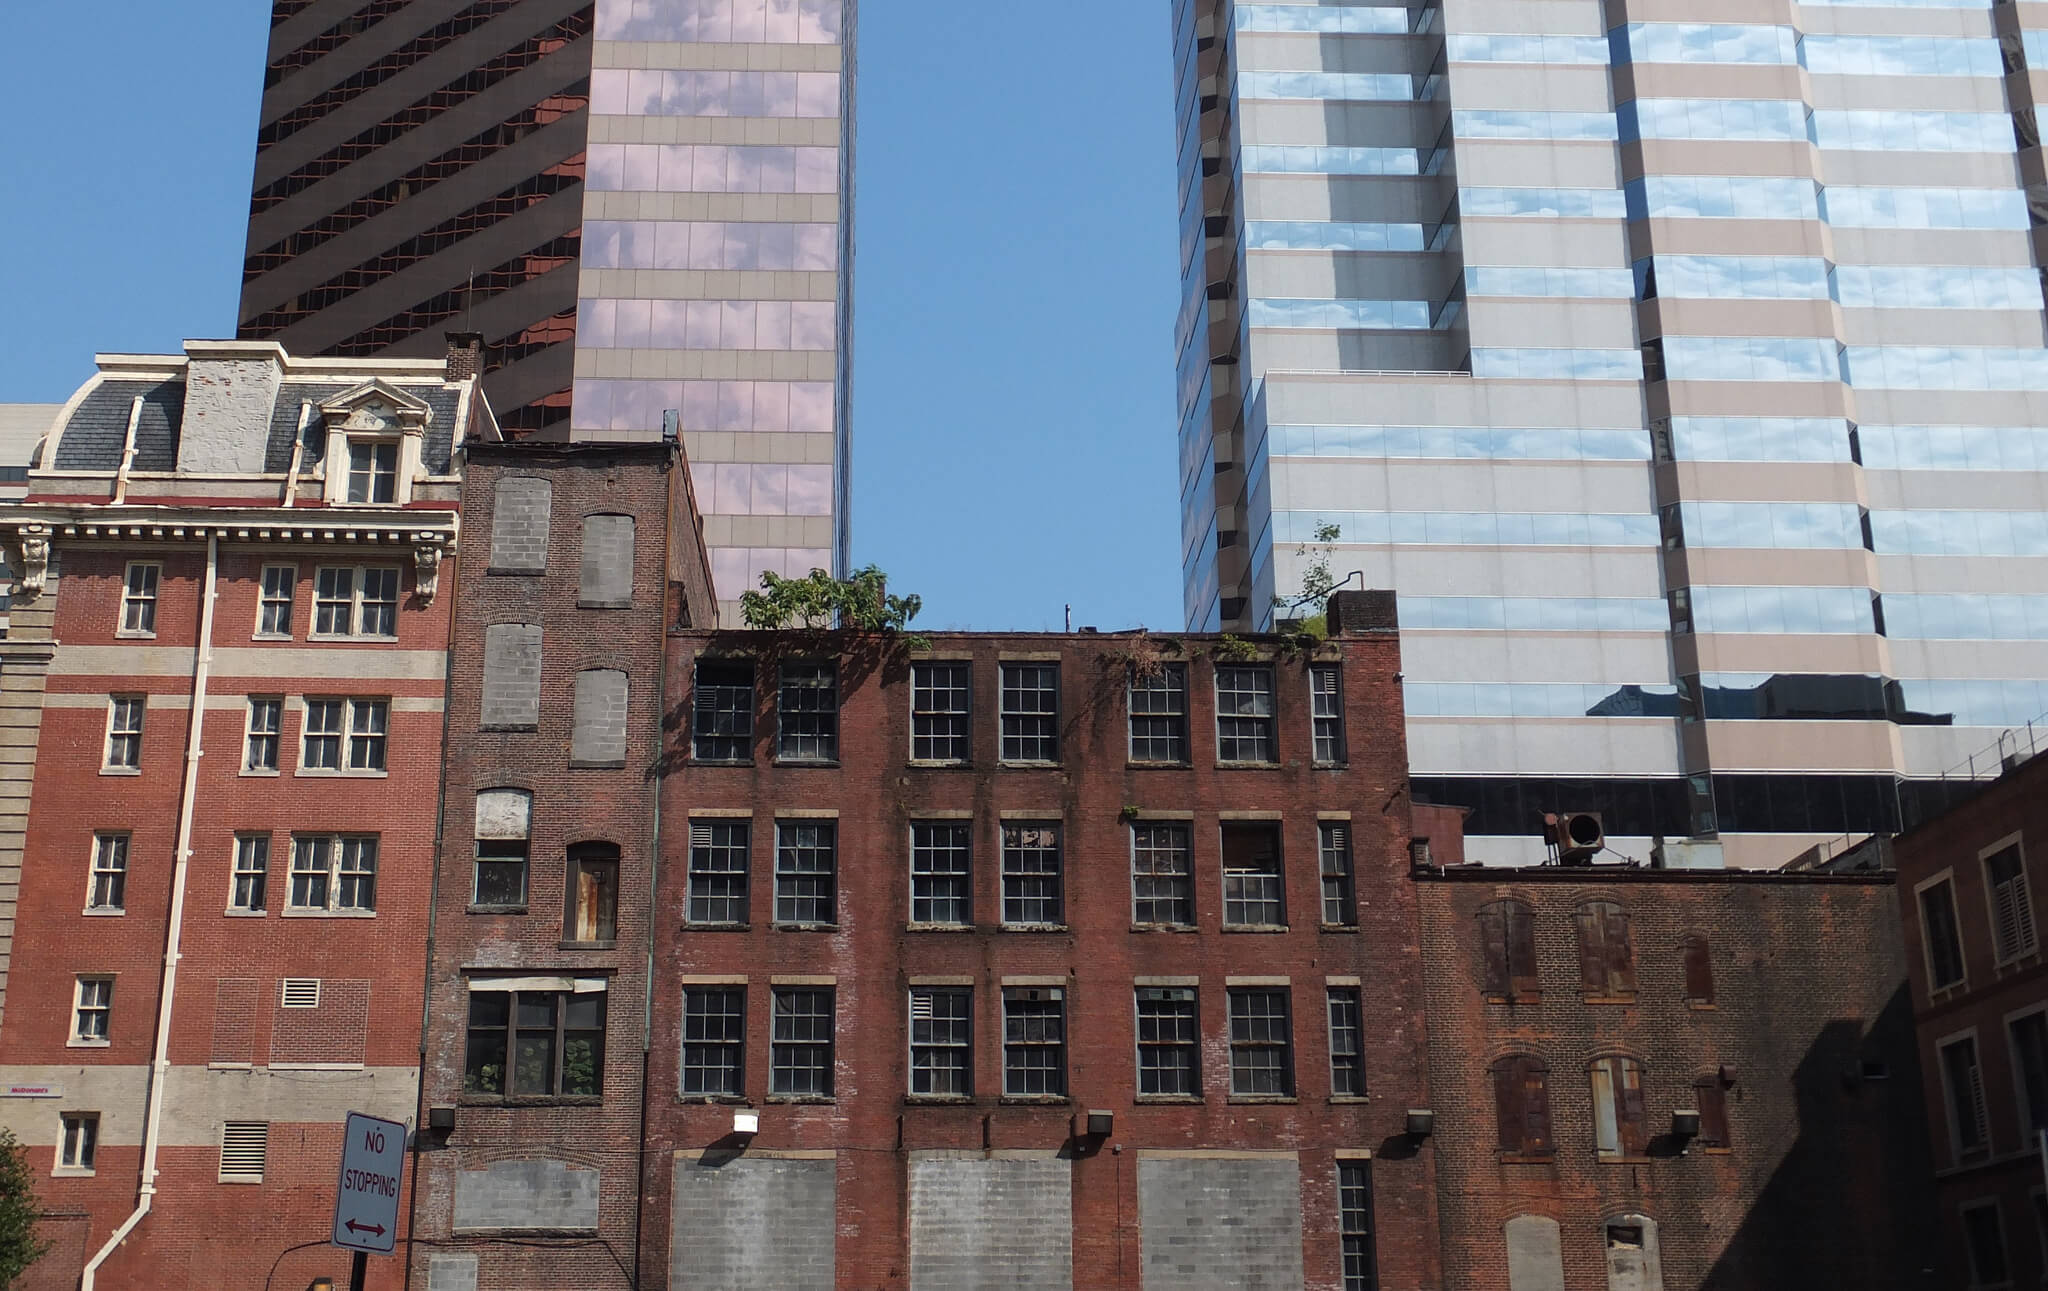 Urban blight in Baltimore, Maryland.